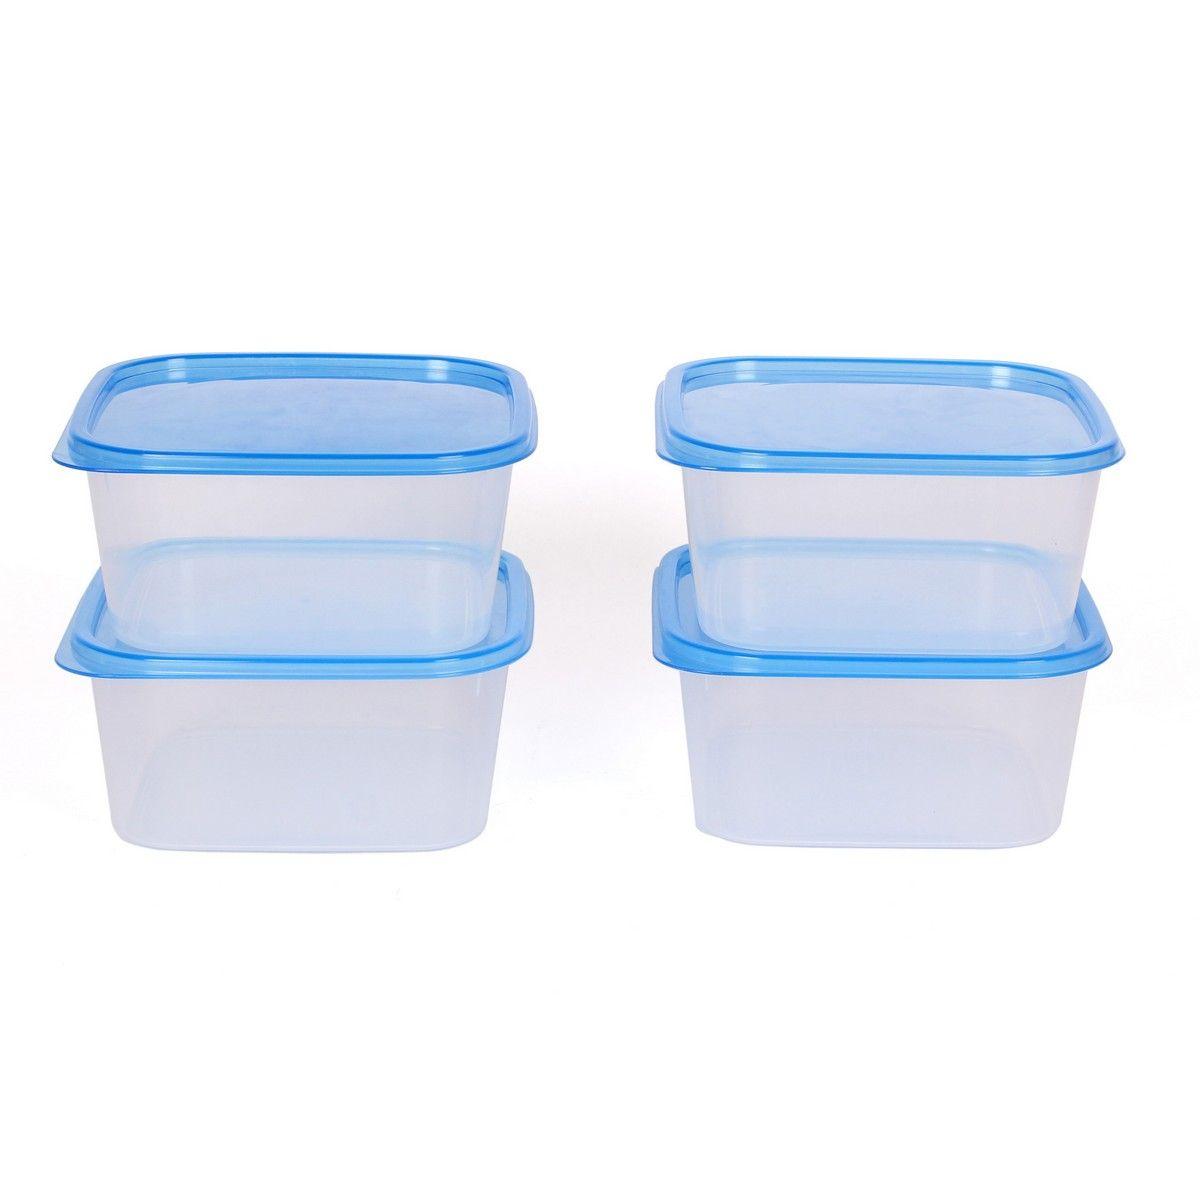 Buy gluman 4 pcs set of plastic kitchen storage container for Plastic kitchen set